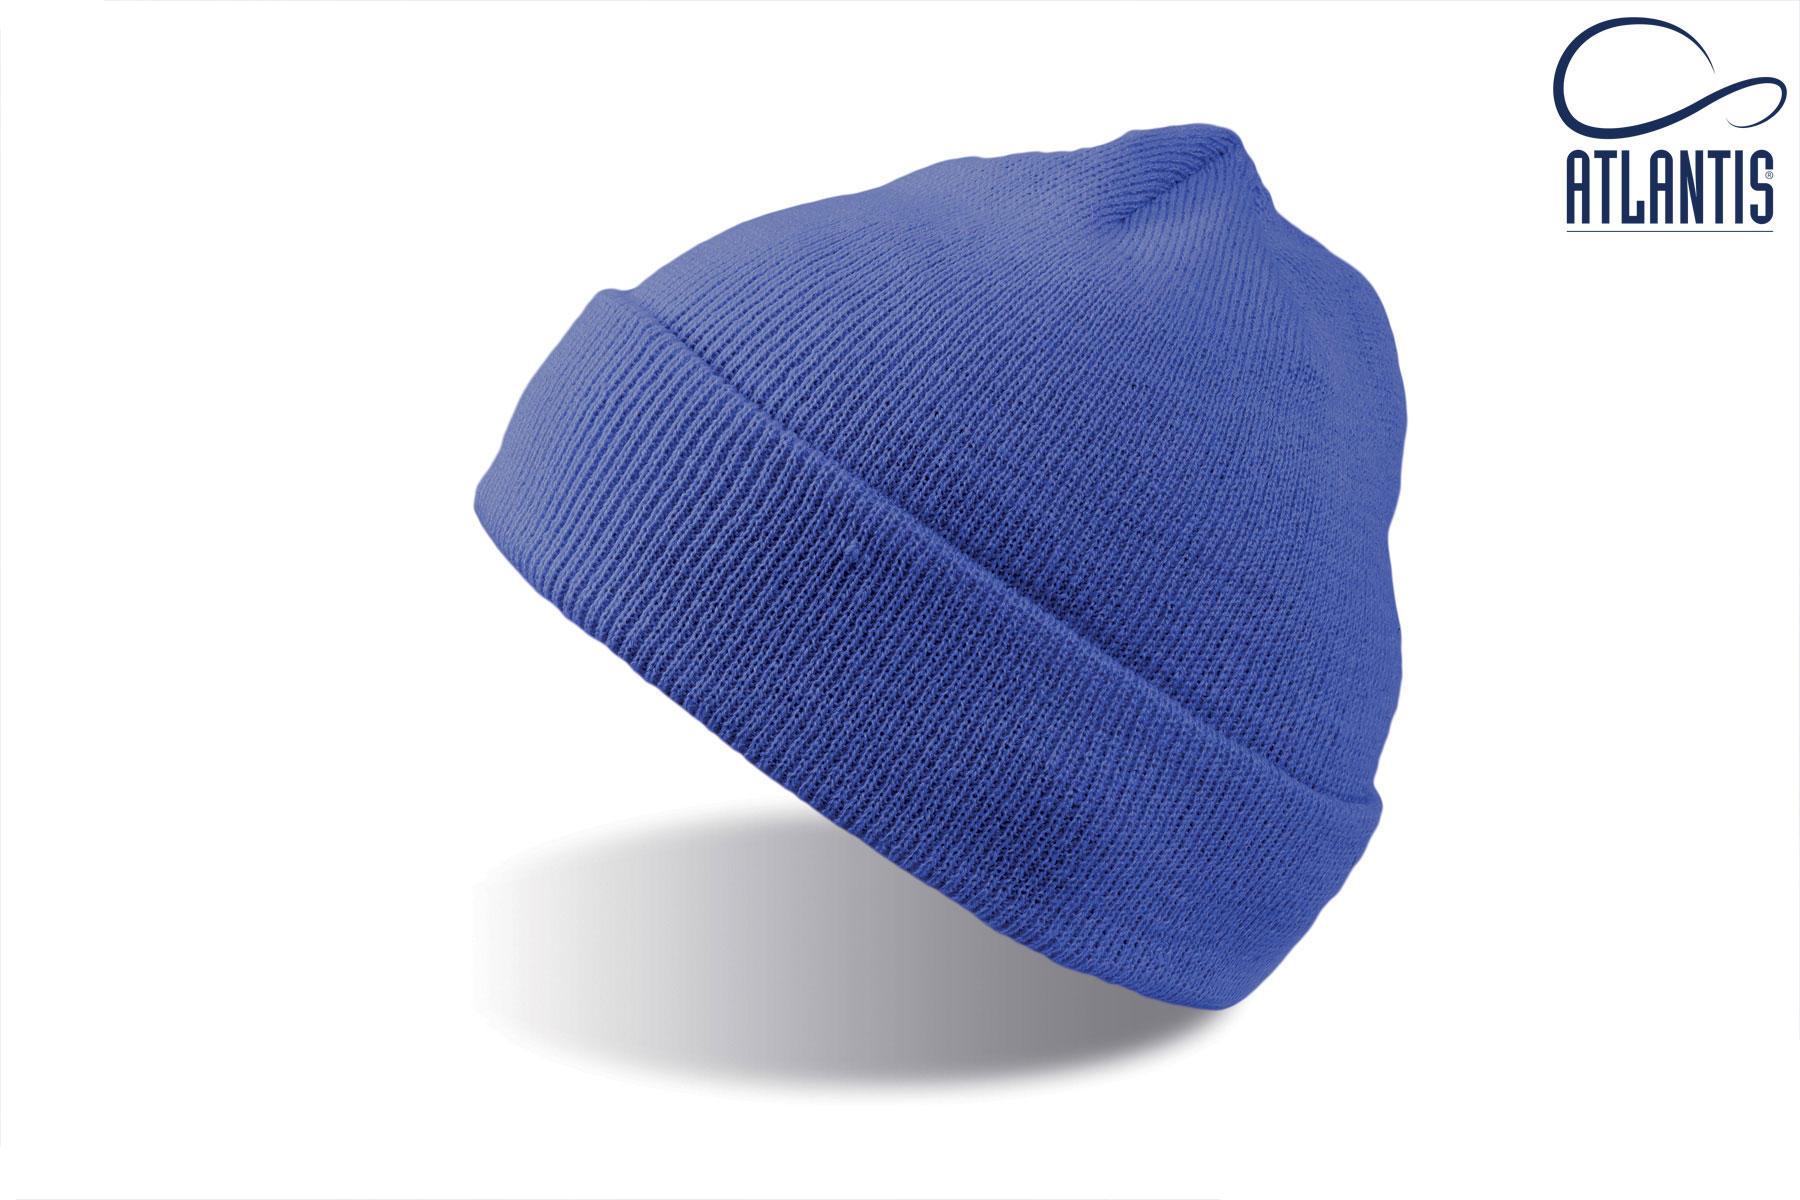 zimska kapa wind svetlo modra